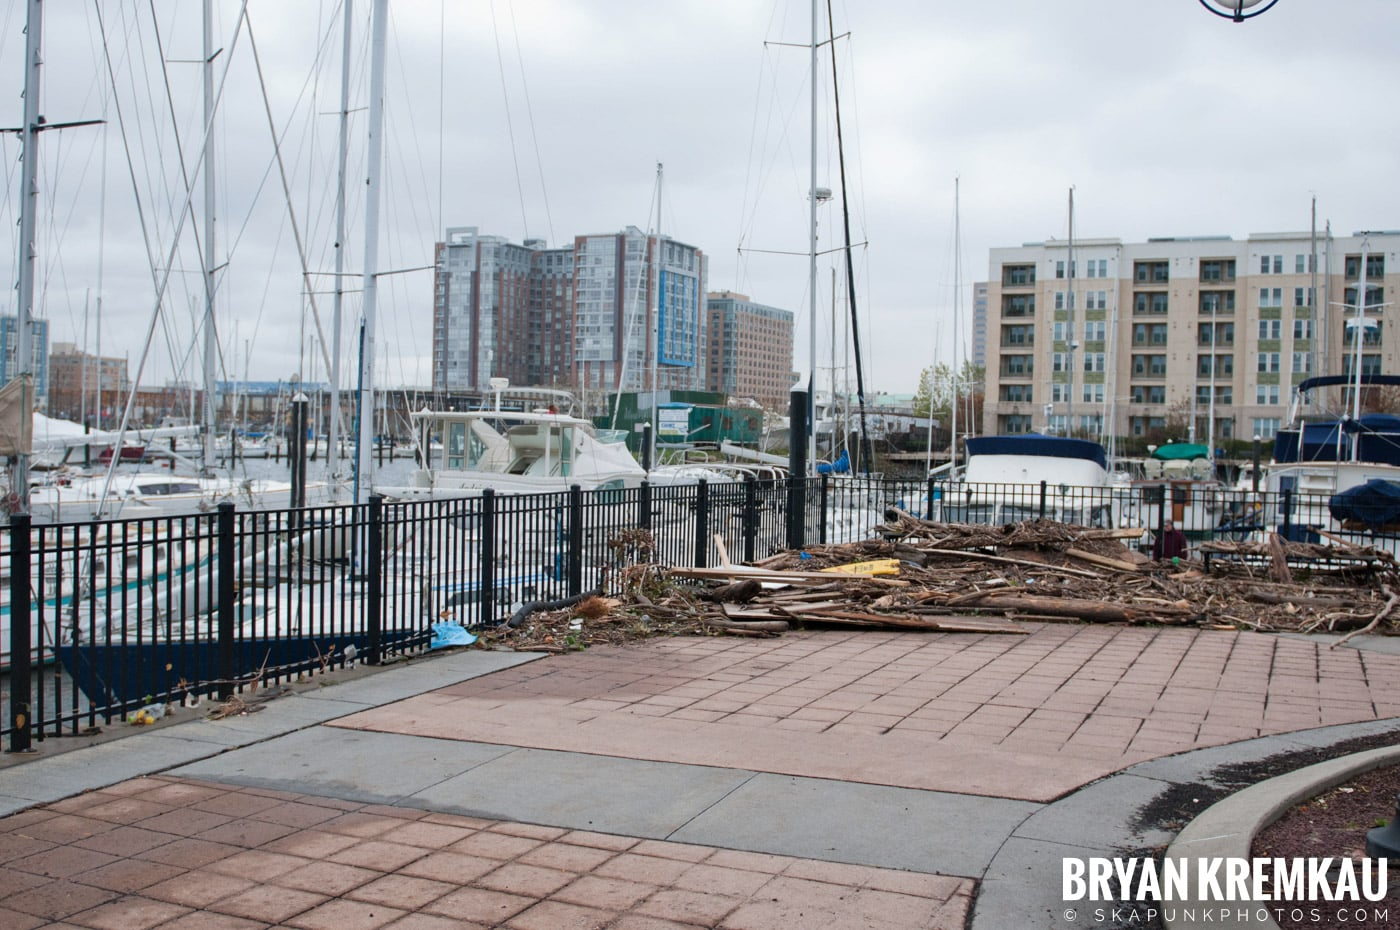 Hurricane Sandy 2012 @ Paulus Hook, Jersey City - 10.29.12 - 10.30.12 (20)